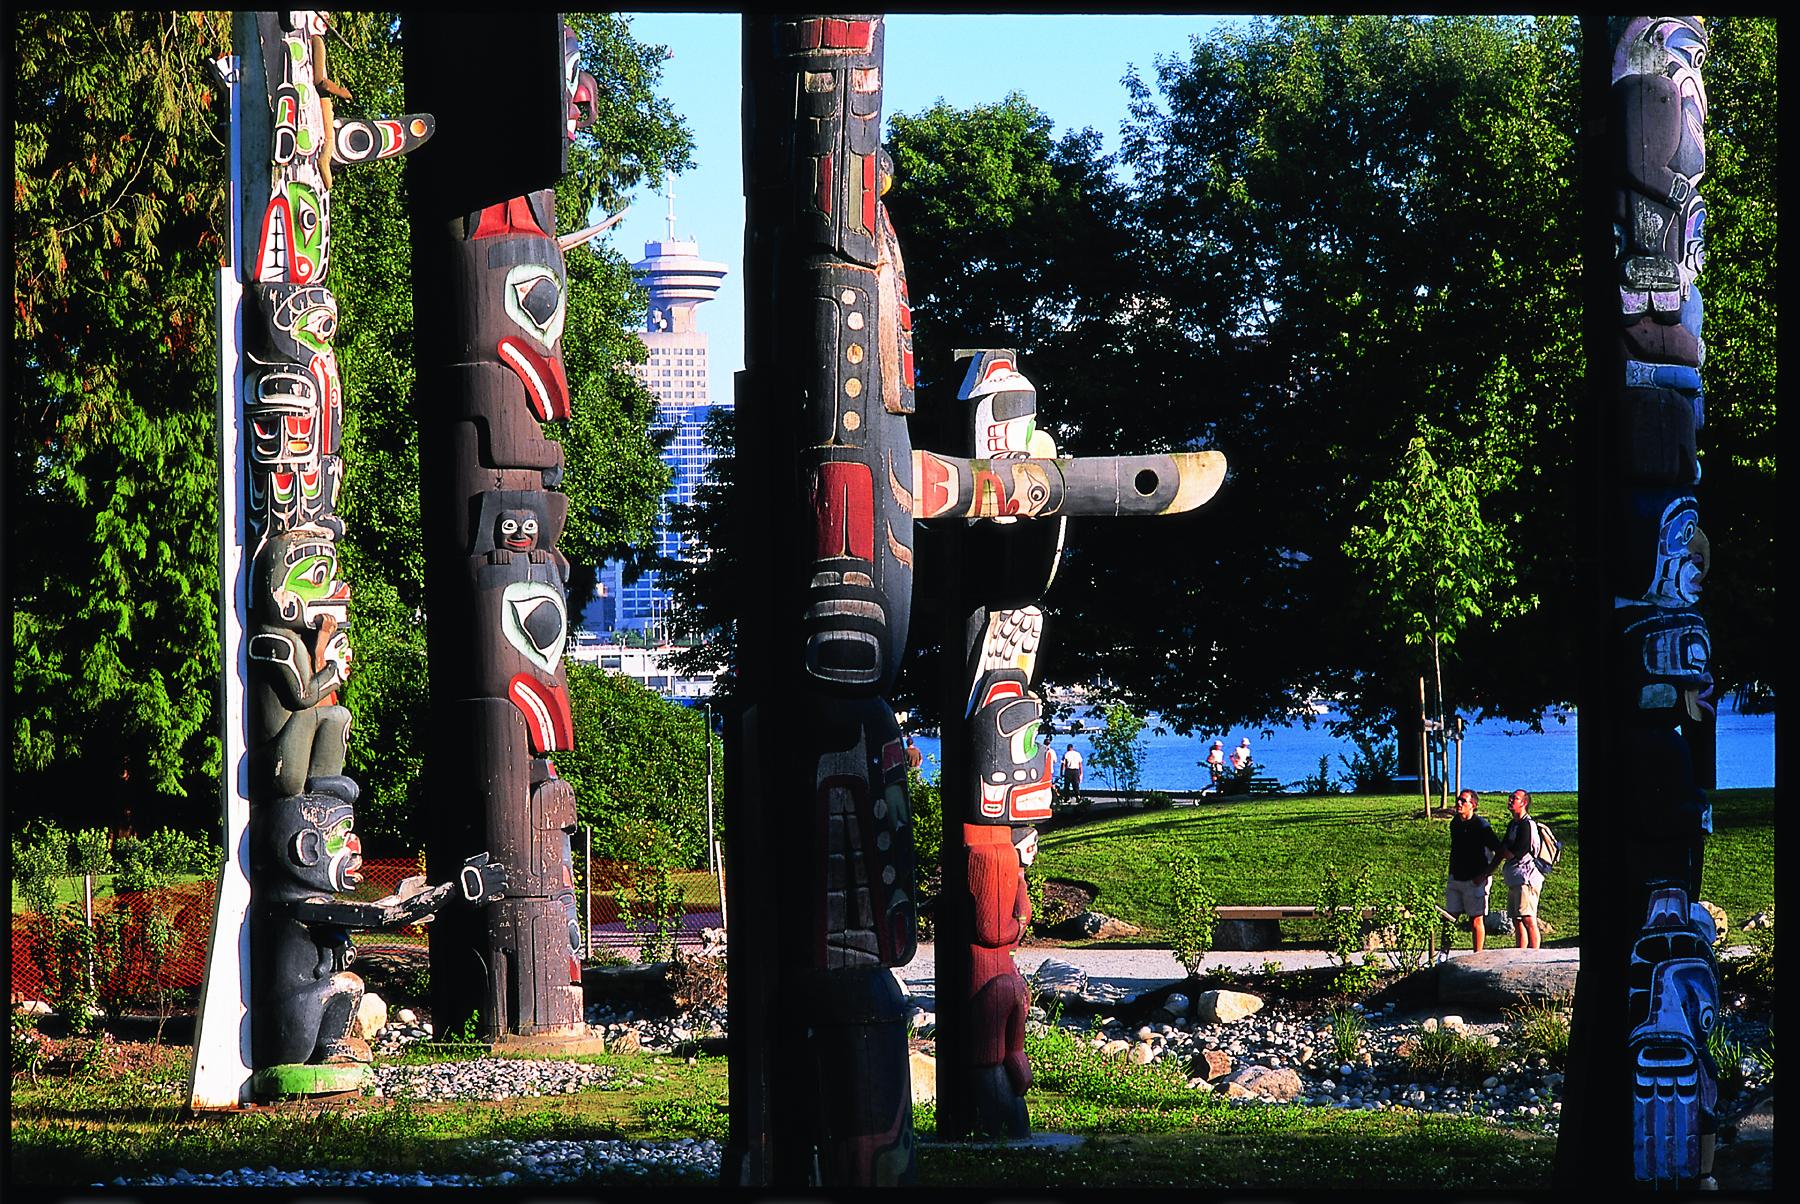 Stanley Park Totem view Poles near Granville Island Hotel